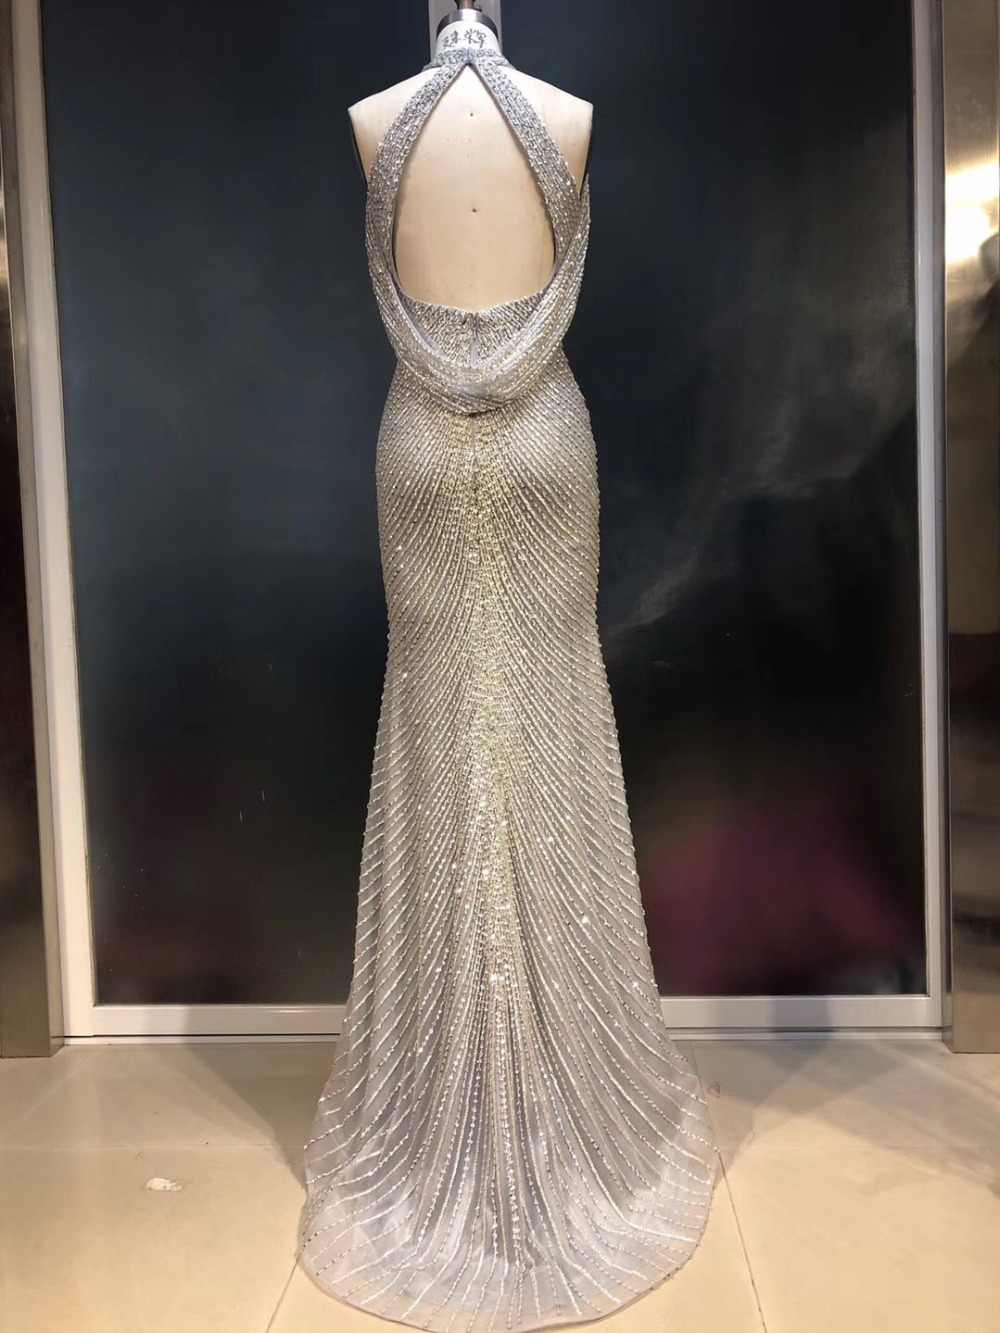 abb1a1ee035 ... Fabulous New Design Long Evening Dress 2019 High Neck Sleeveless  Beading Mermaid Prom Dresses Robe de ...